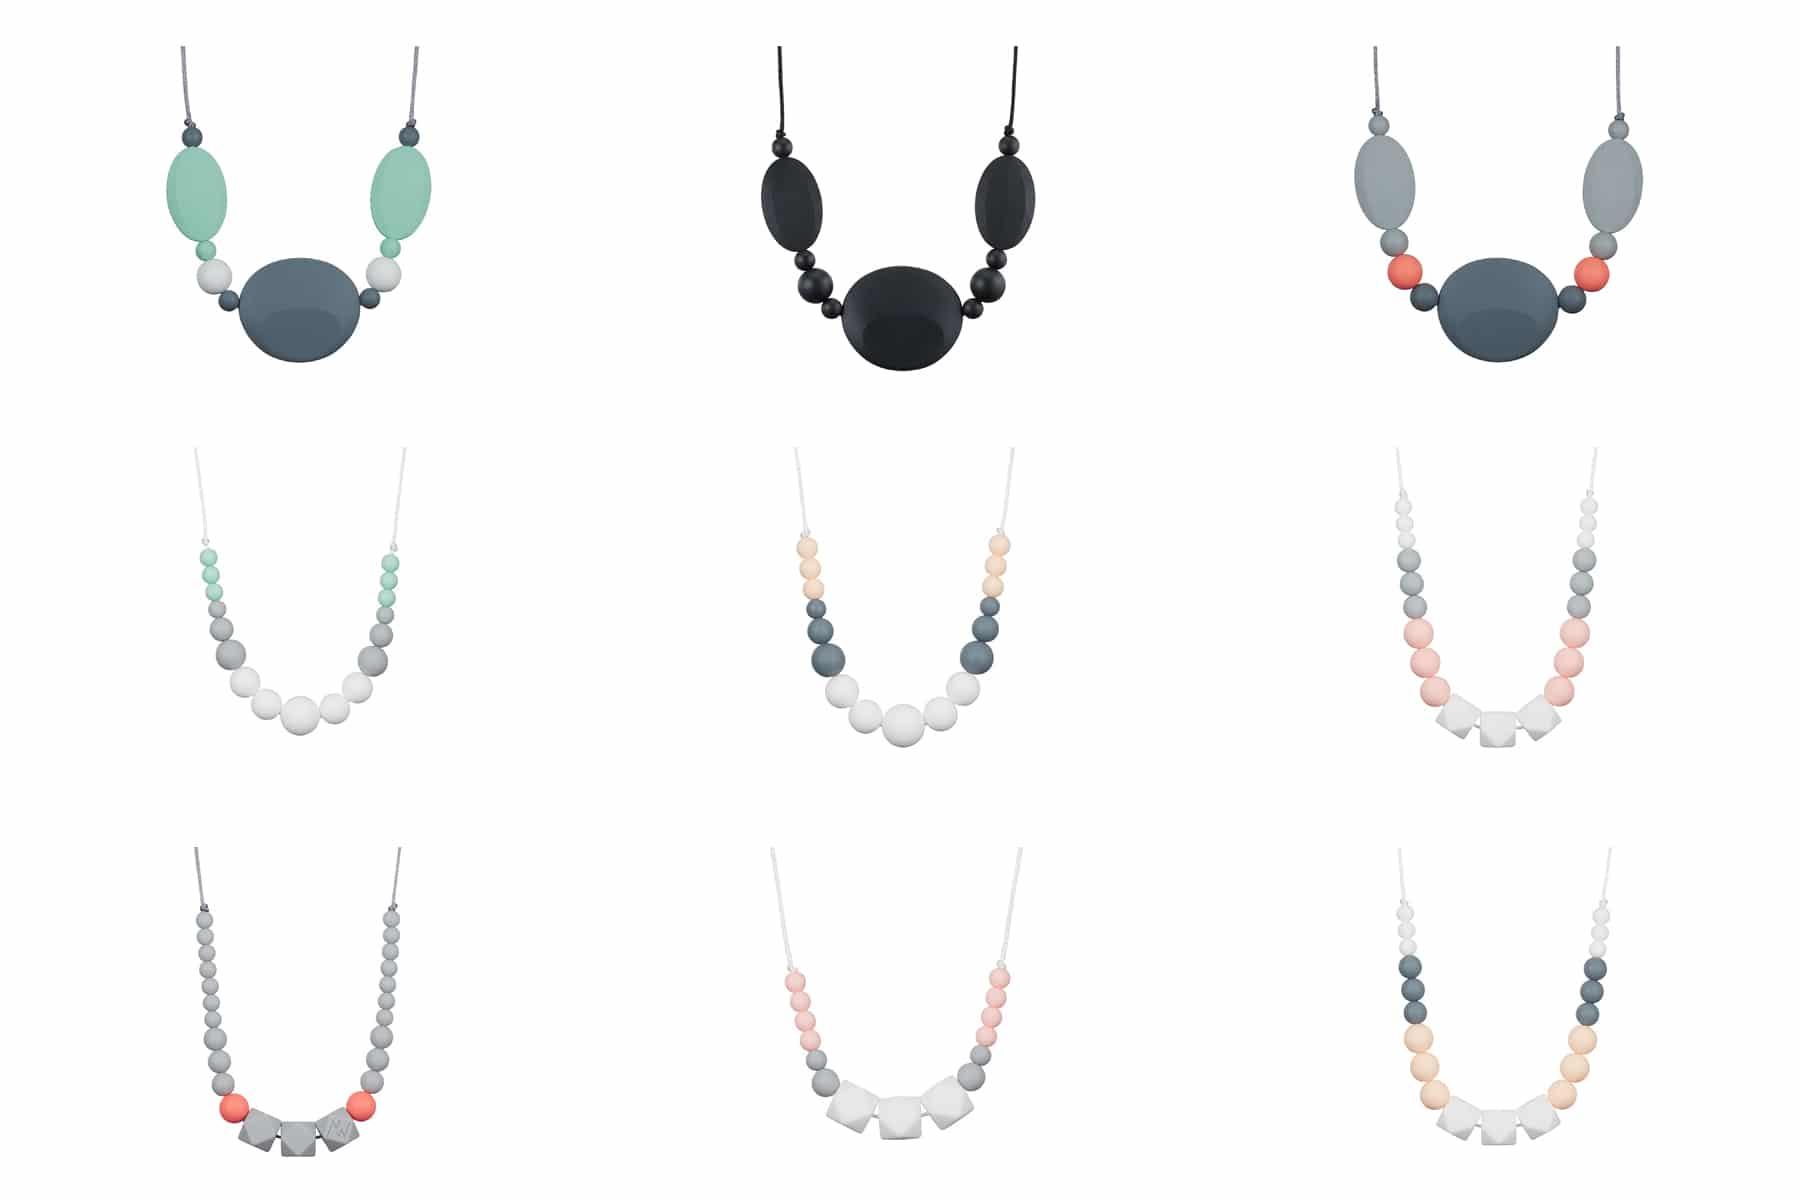 Packshot collier de perles en silicone